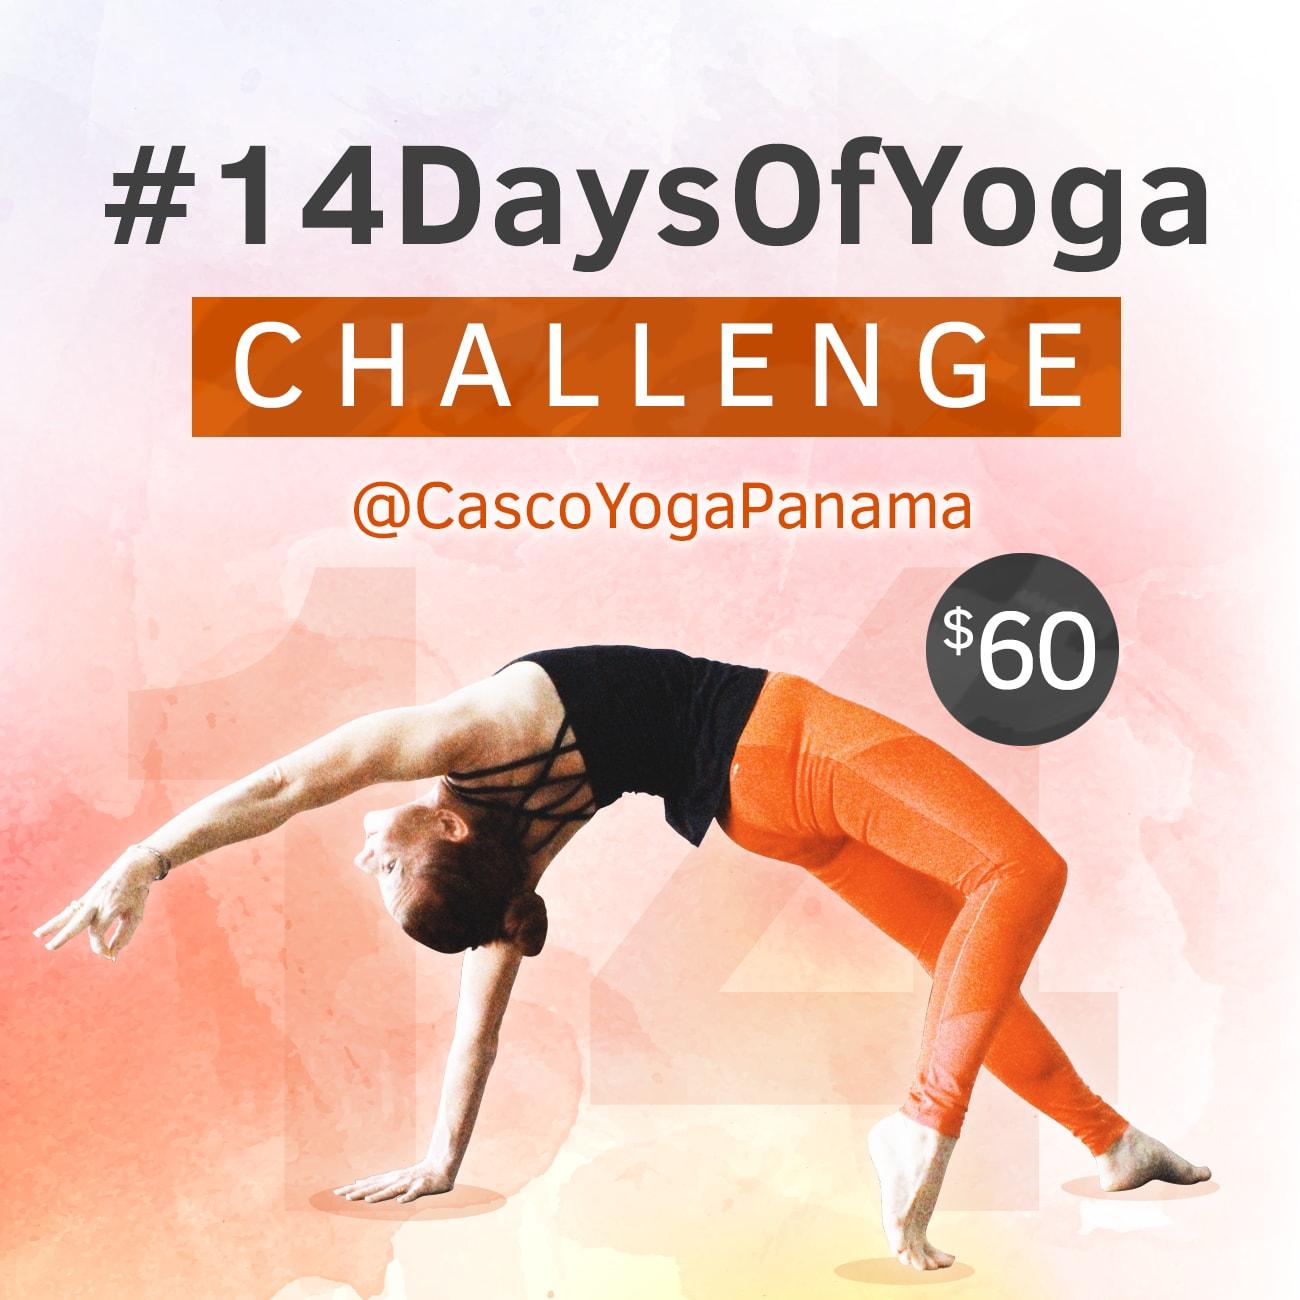 14 Days Of Yoga Challenge at Casco Yoga Panama, Casco Viejo. Panama City